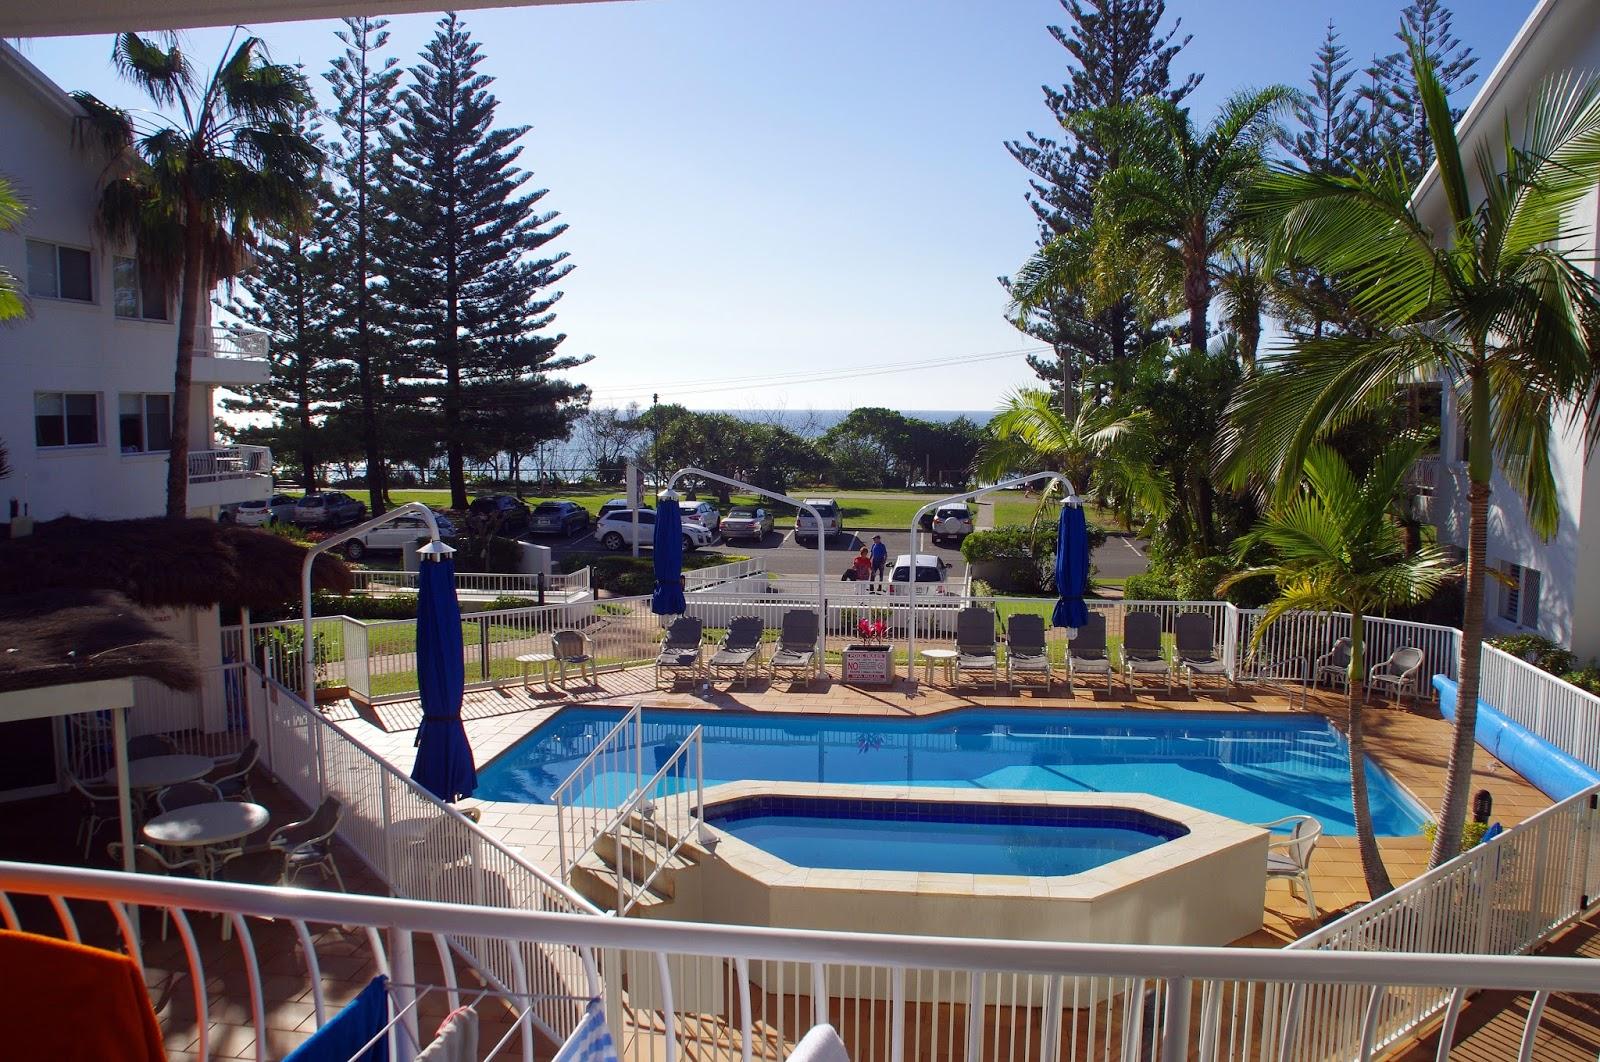 Le beach Apartments Burleigh Heads View from Balcony